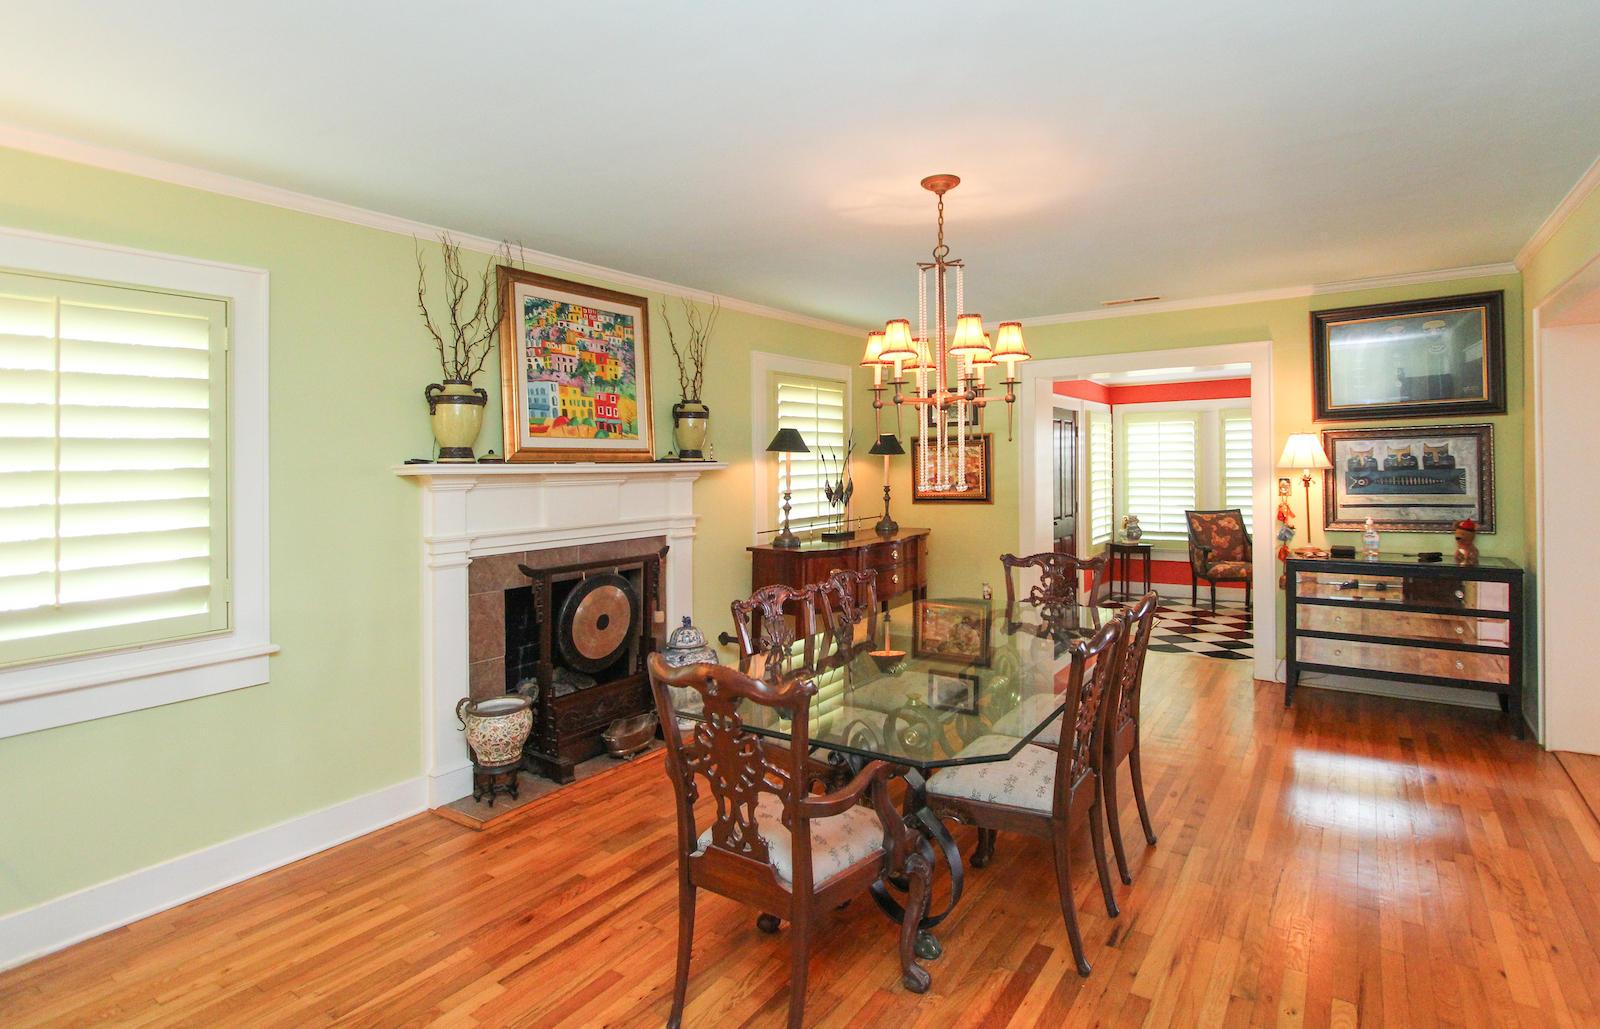 Albemarle Point Homes For Sale - 3 Albemarle, Charleston, SC - 23